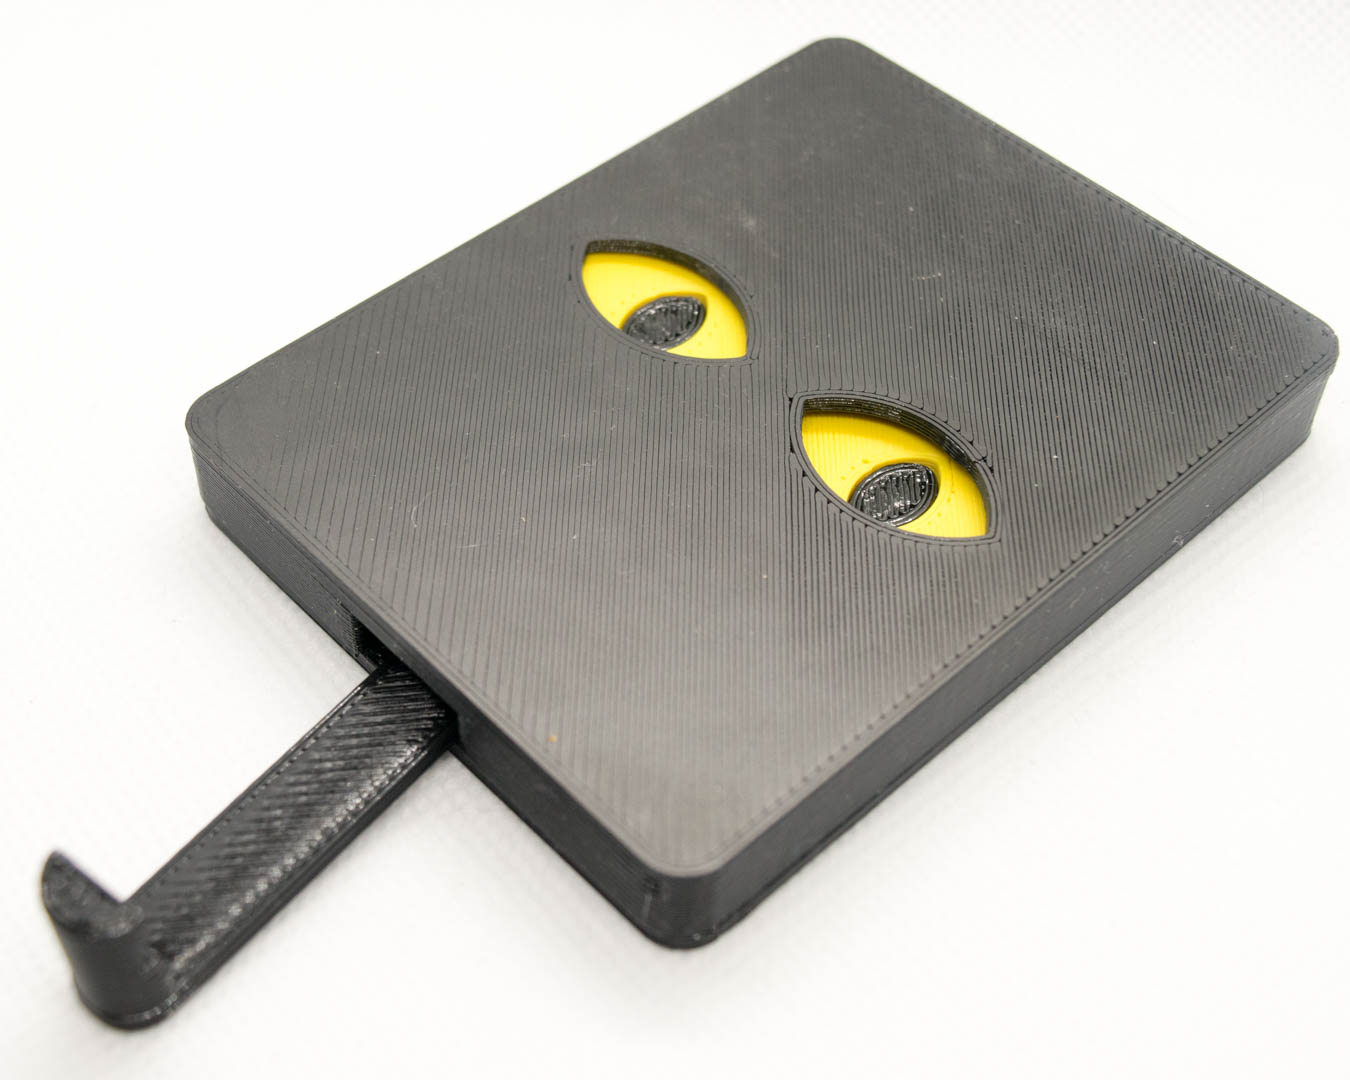 Schlüsselbrett, Keyguard, Gelbe Katzenaugen